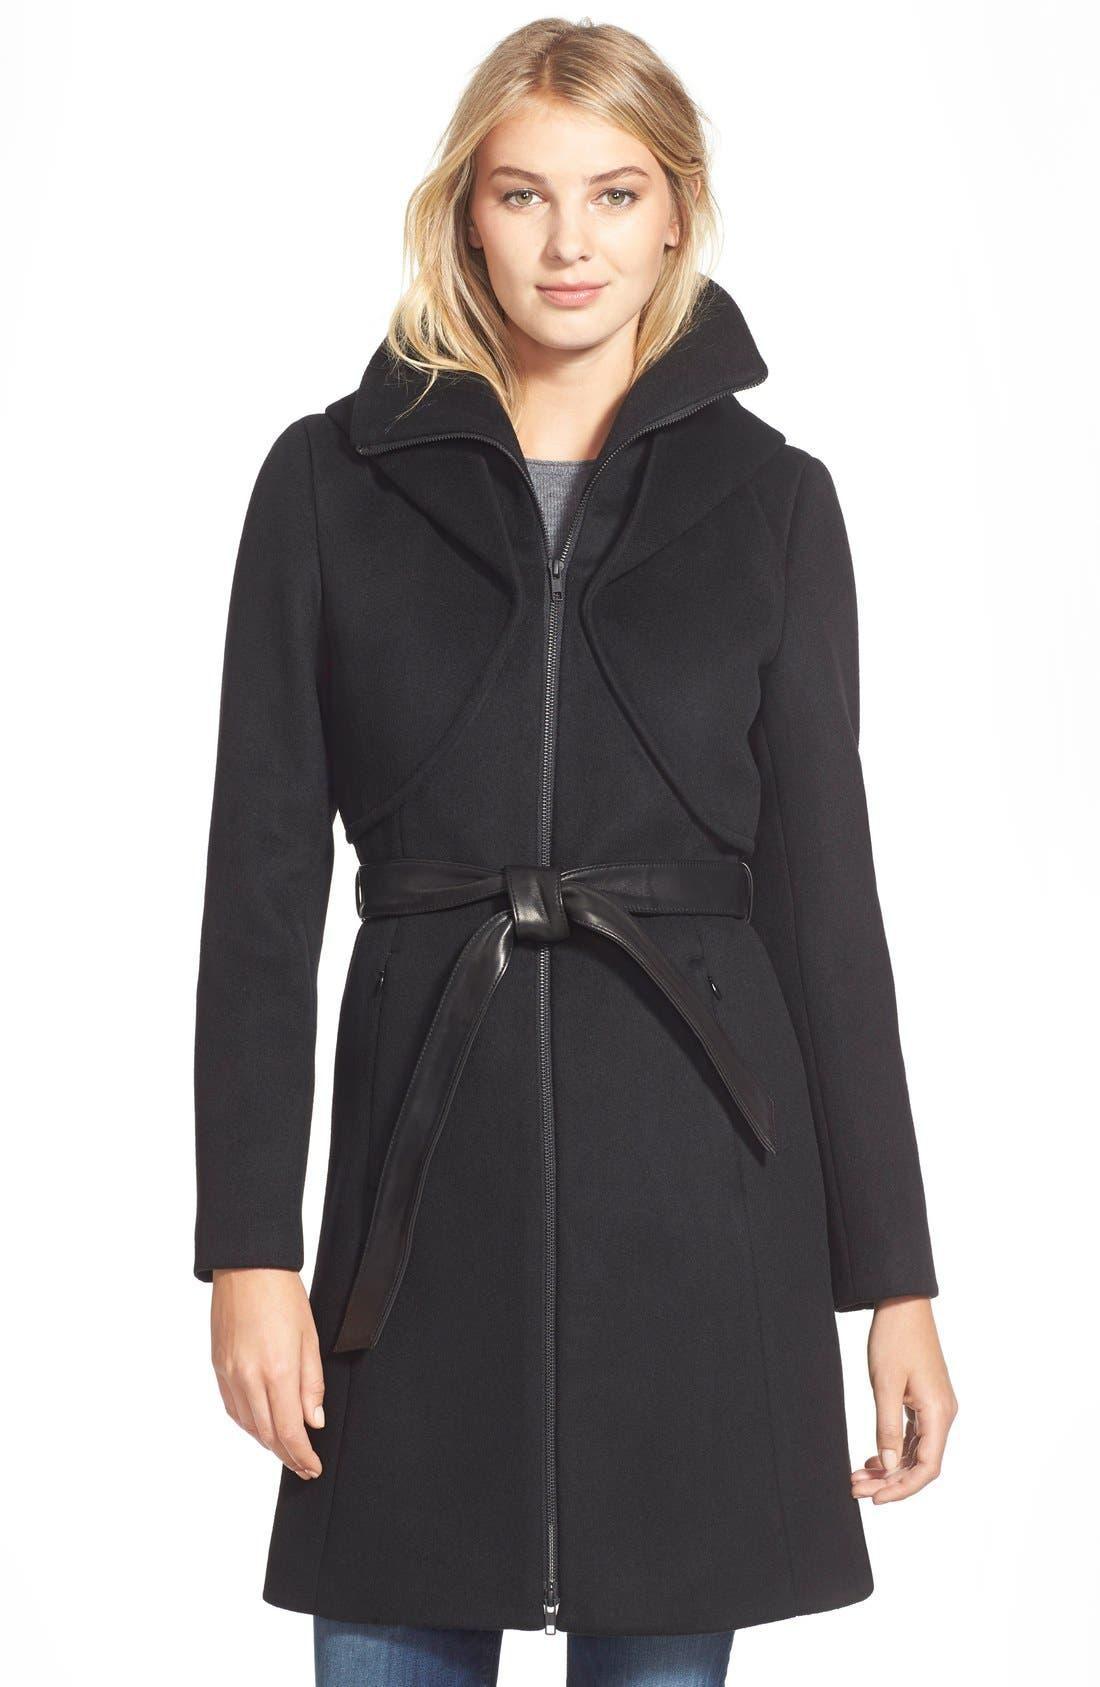 Alternate Image 1 Selected - Soia & Kyo 'Arya' Hooded Wool Blend Coat with Belt